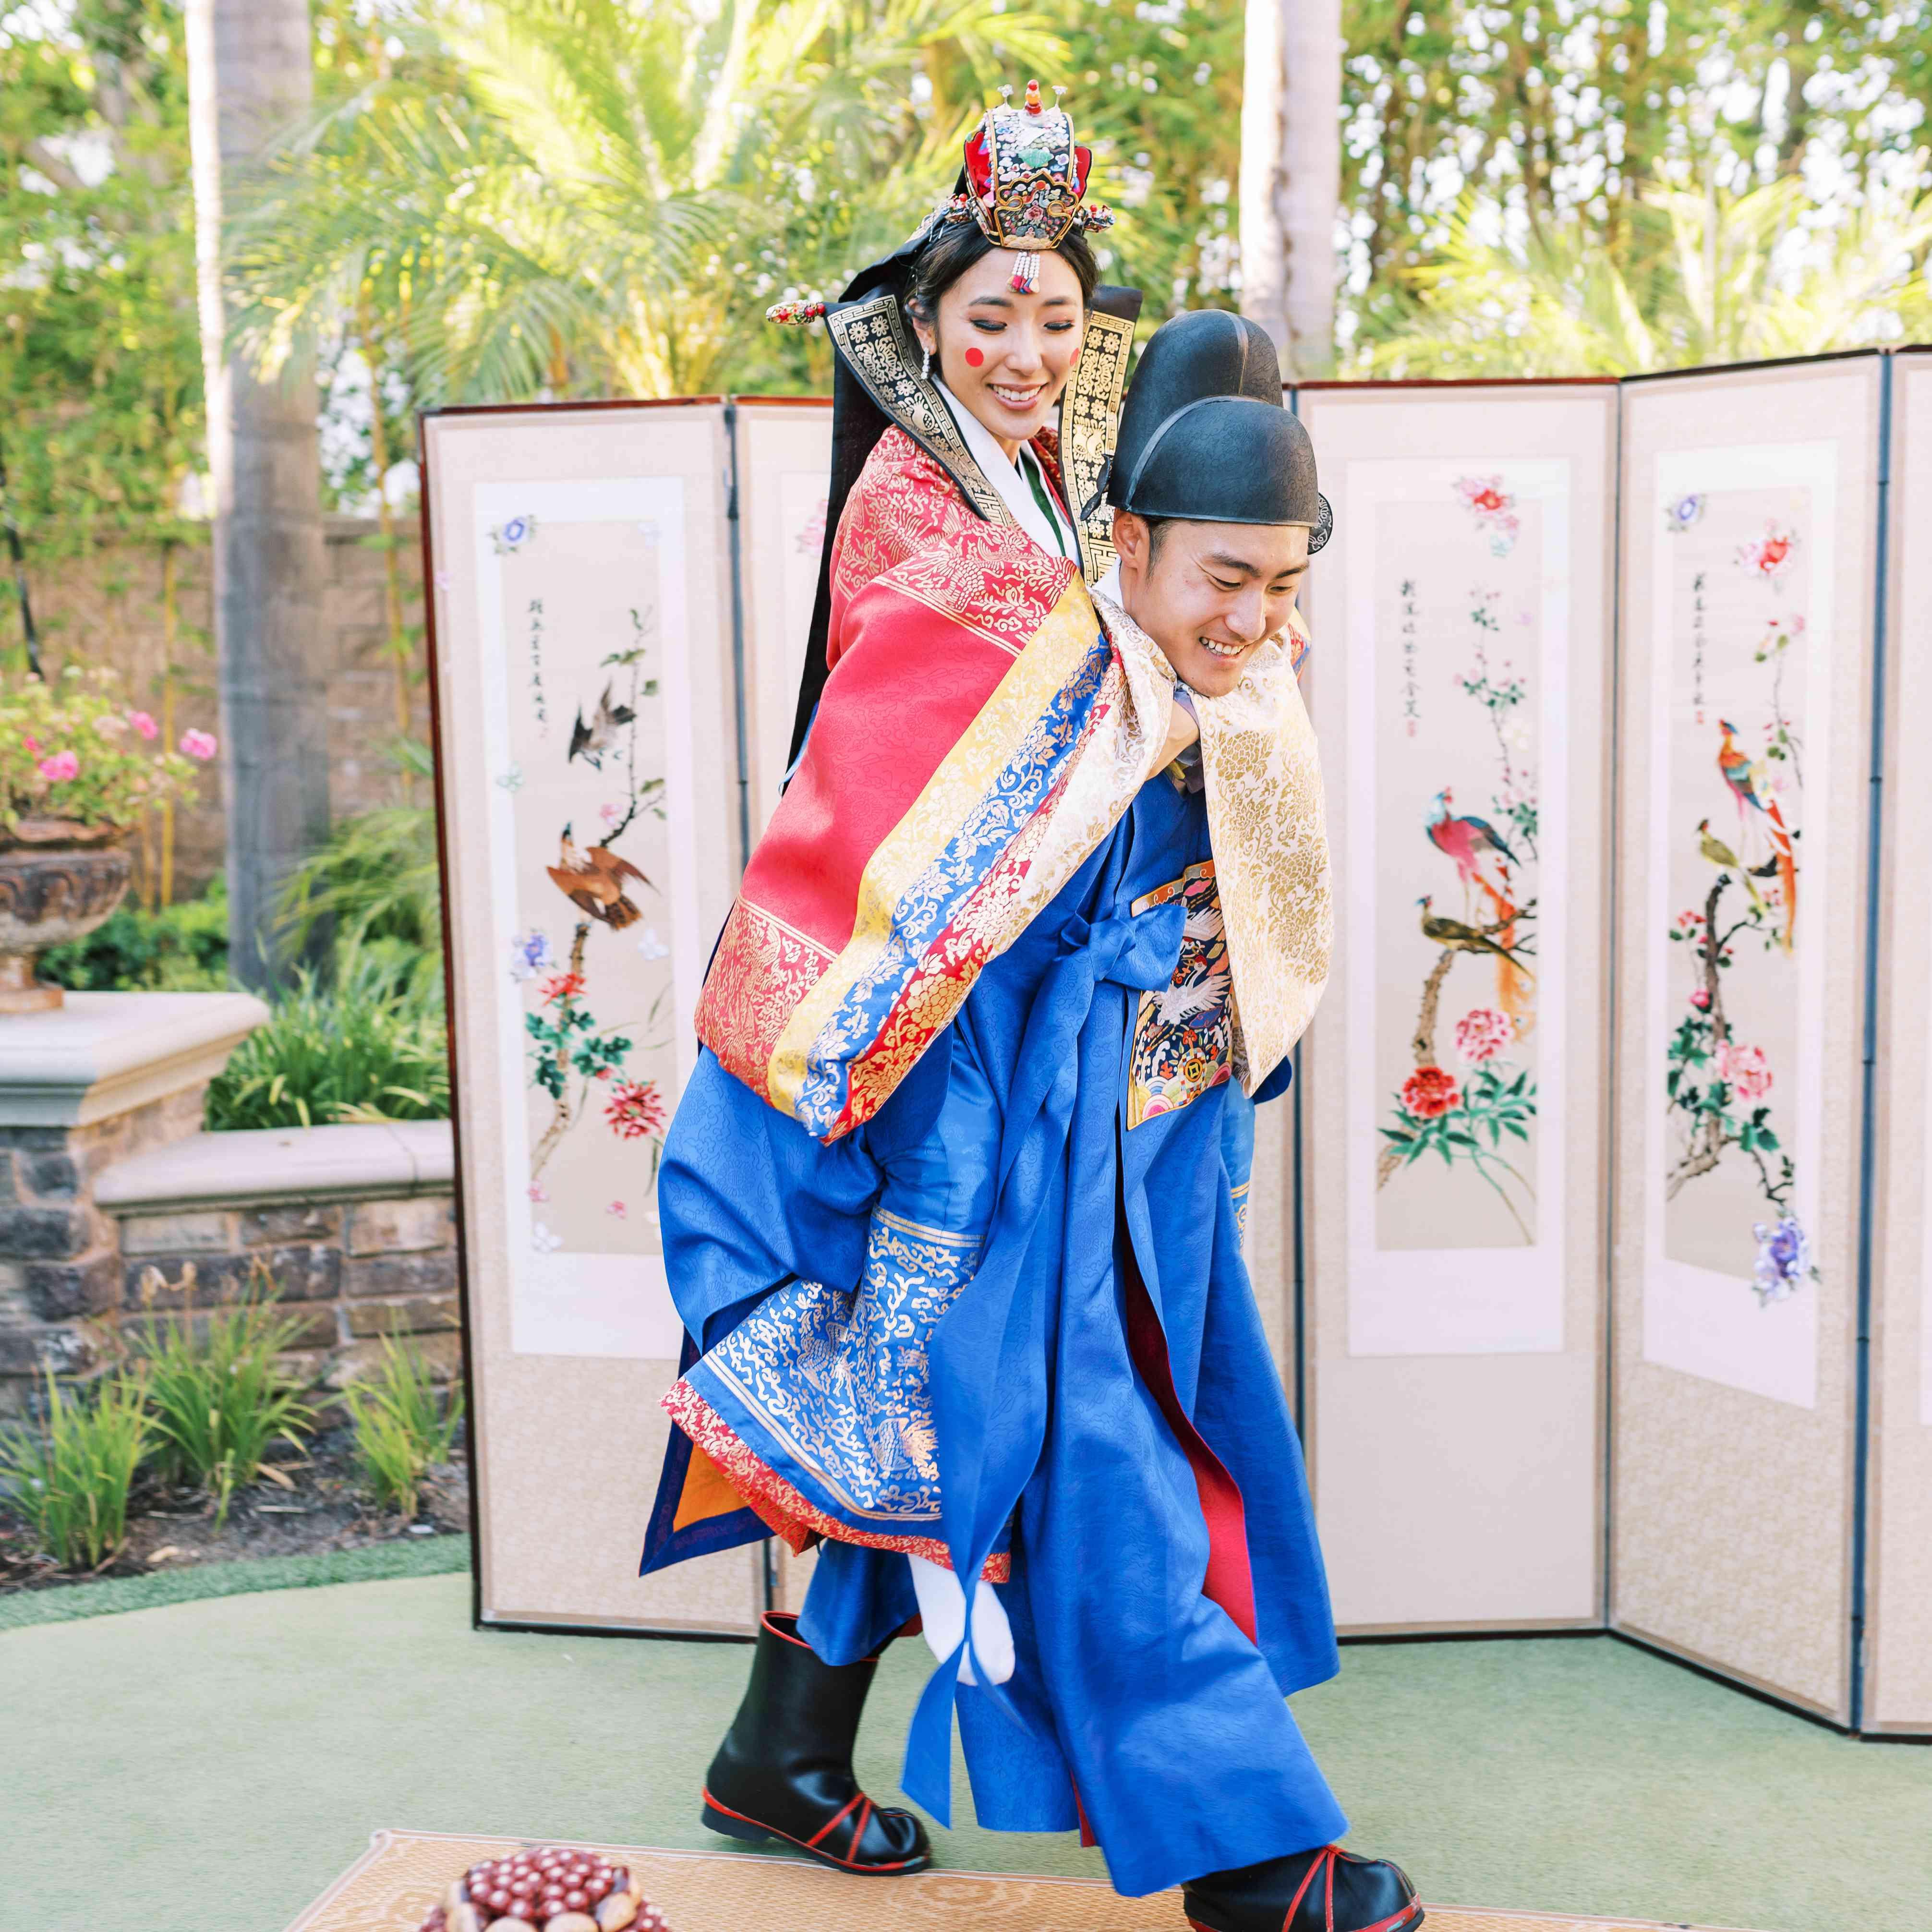 Korean traditions